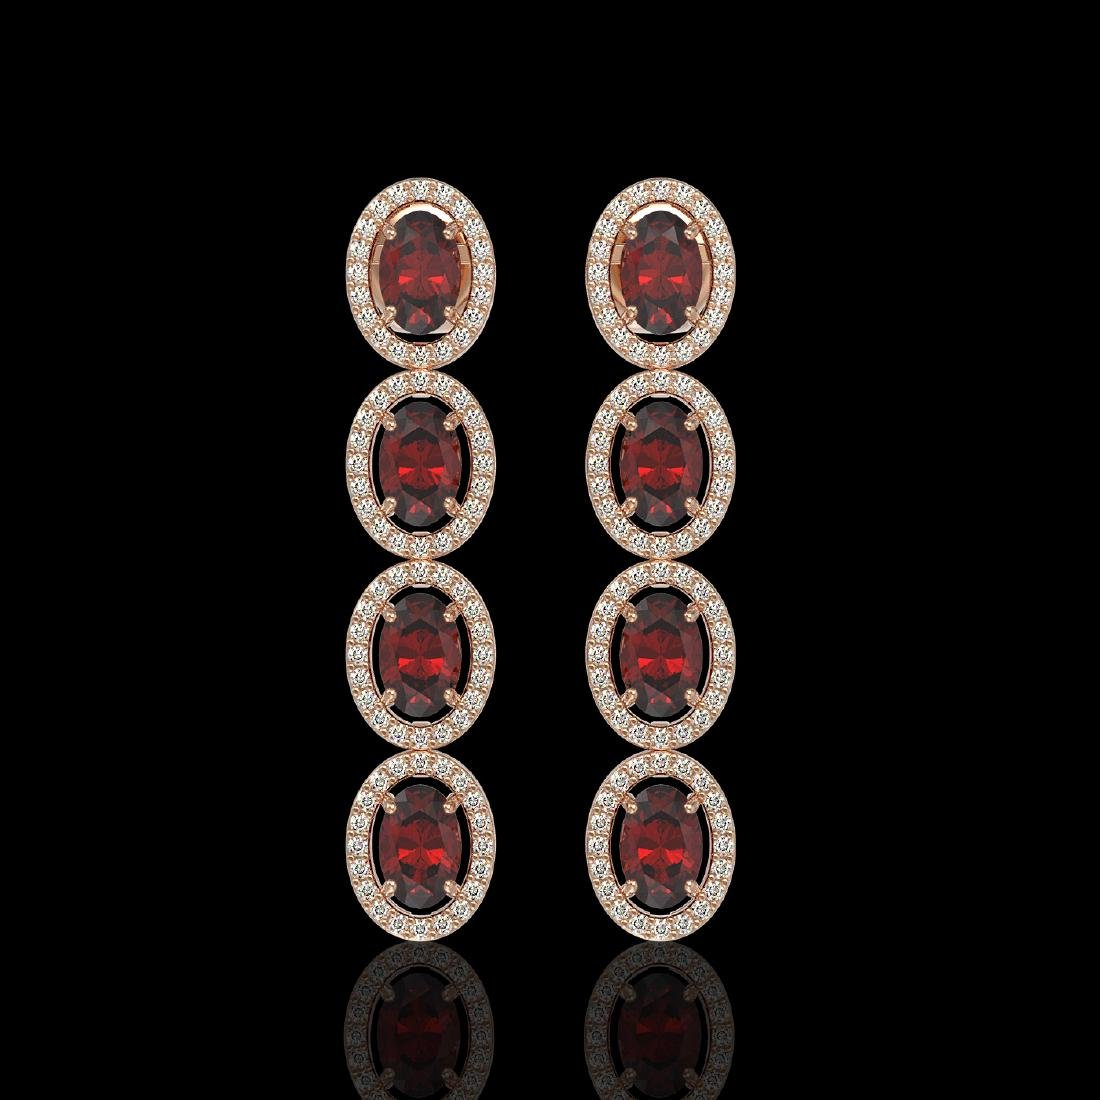 6.2 CTW Garnet & Diamond Halo Earrings 10K Rose Gold